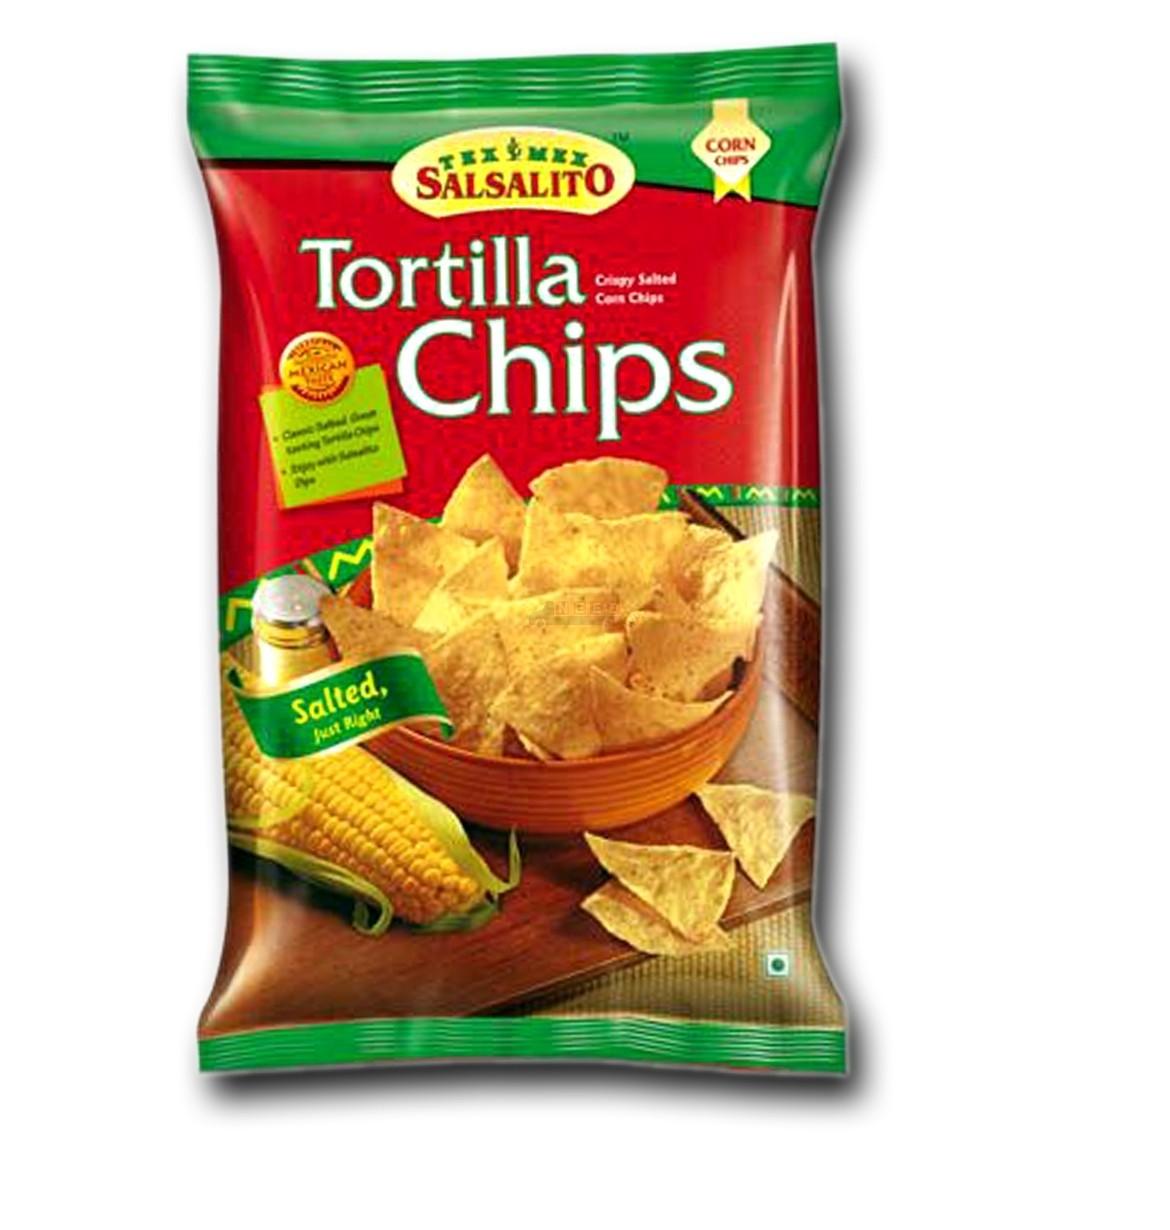 Salsalito Tortilla Chips Image